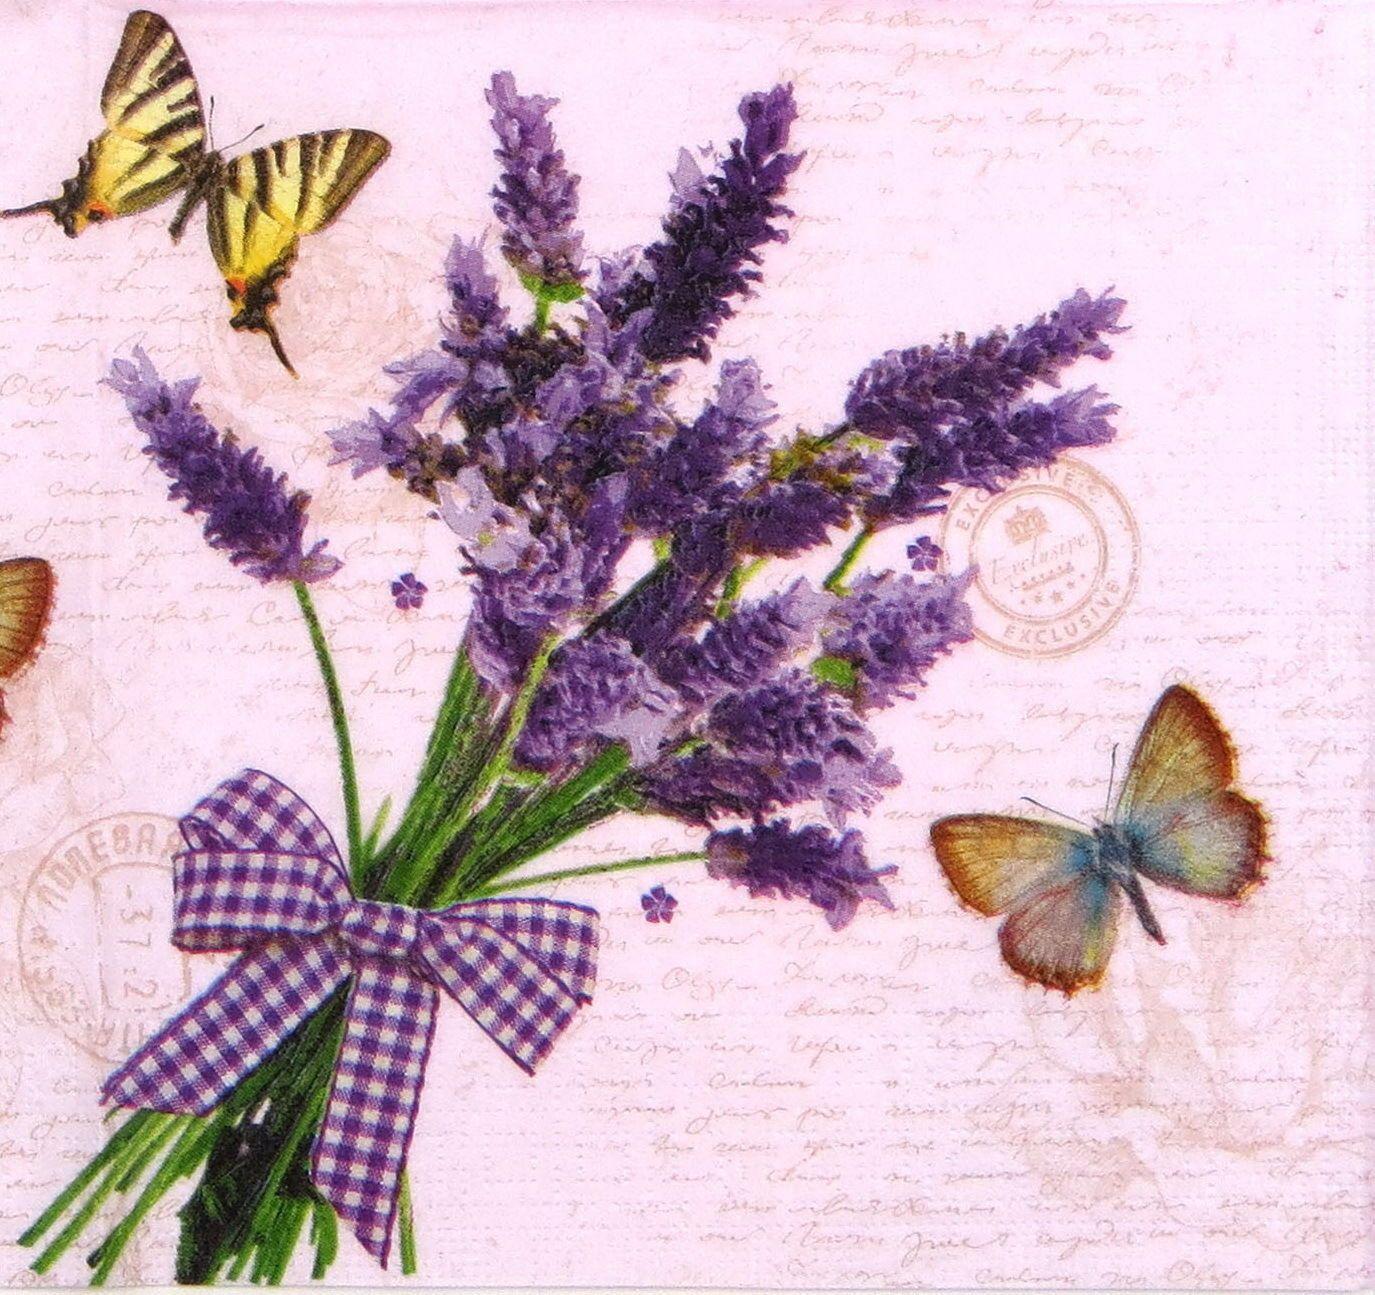 4x Paper Napkins for Decoupage Decopatch Craft Lavender